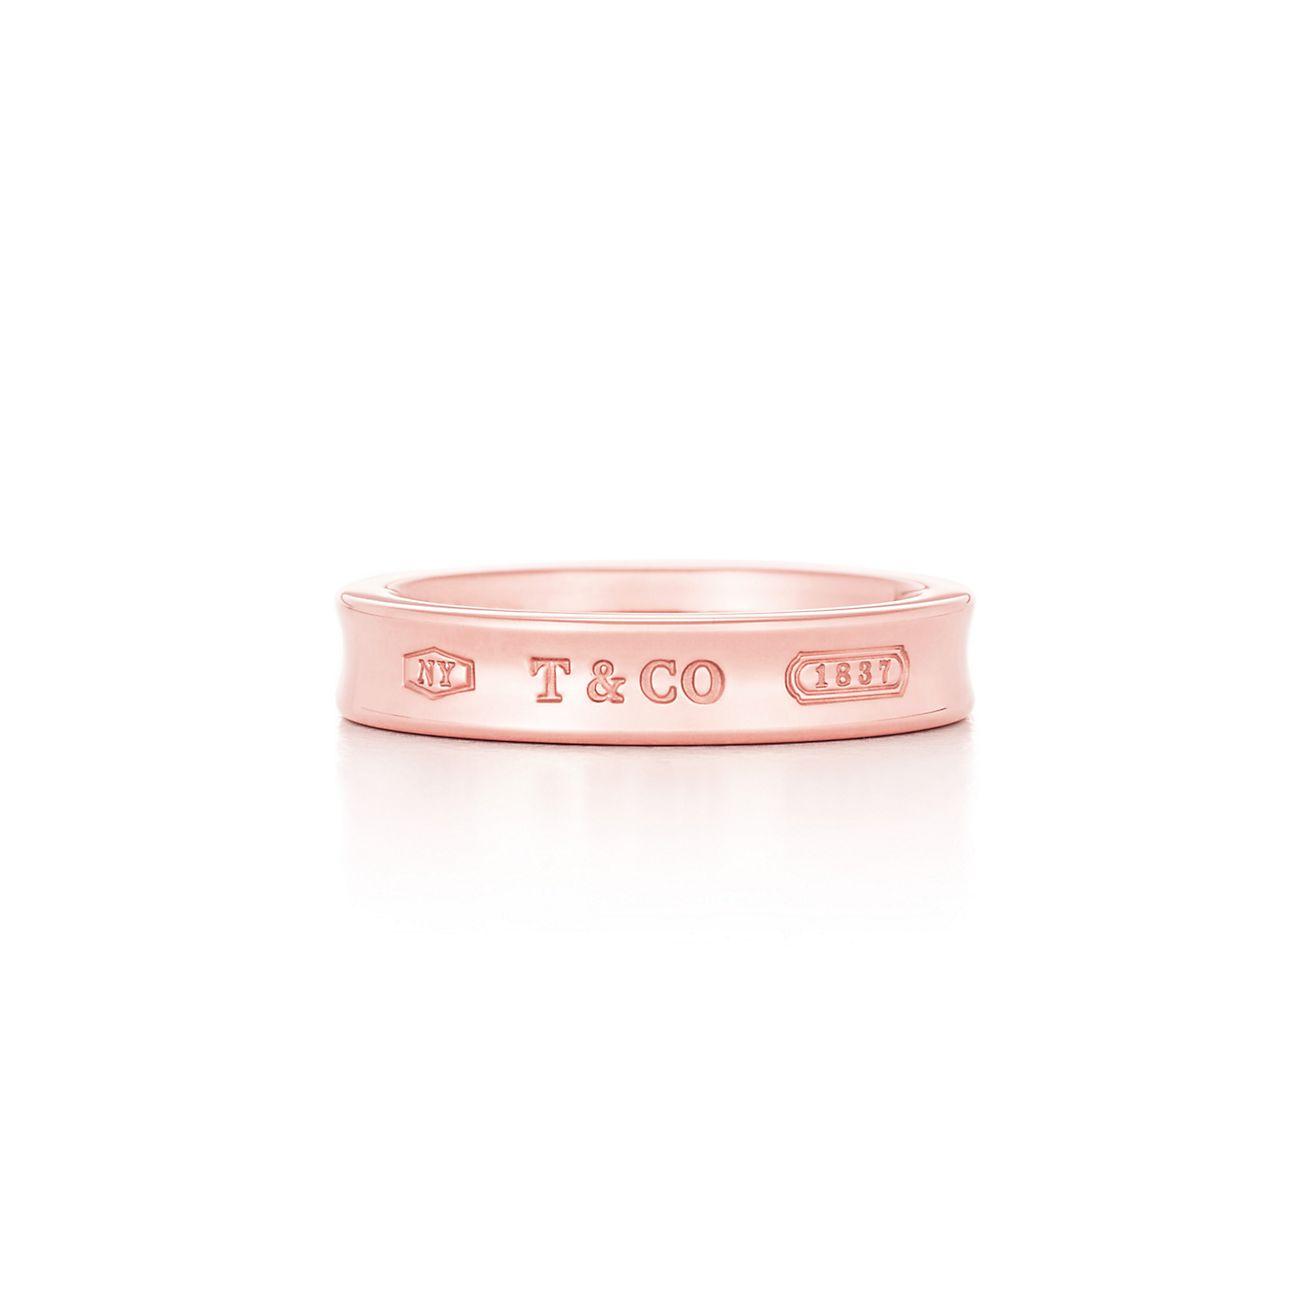 Tiffany 1837 Schmaler Ring Aus Rubedo Metall Tiffany Co